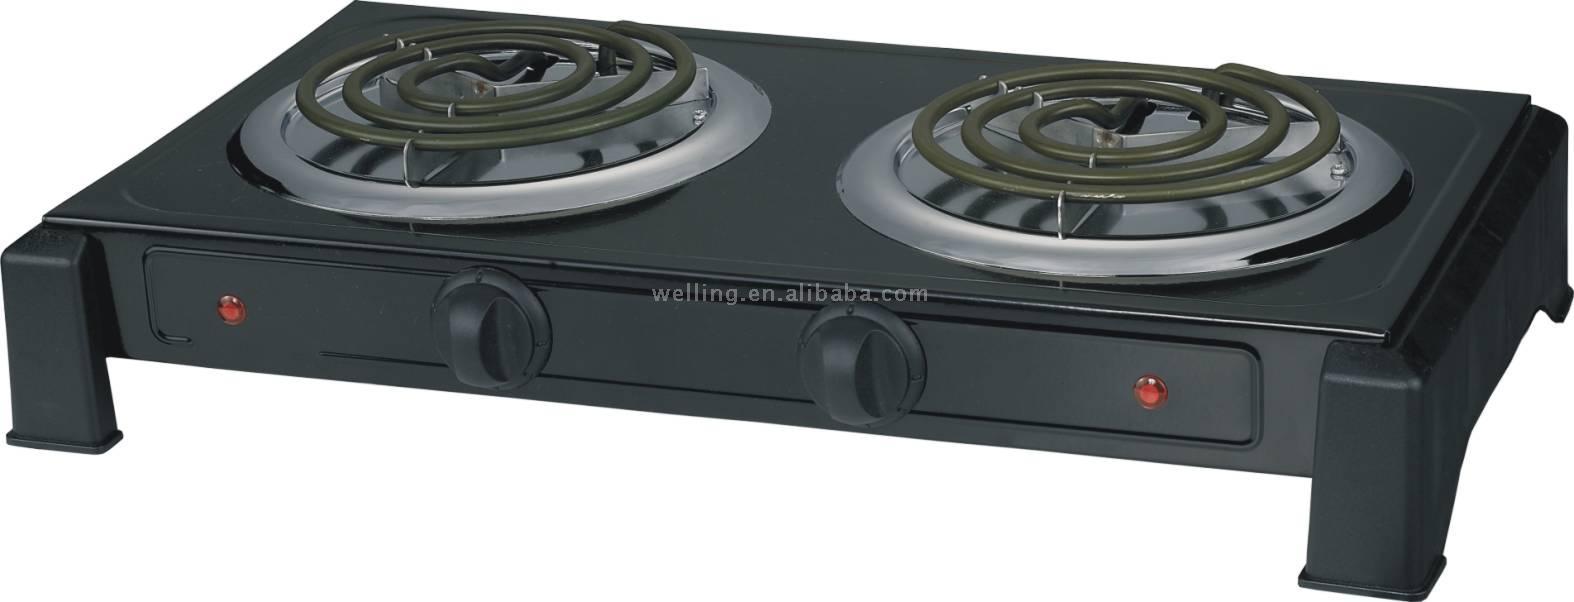 Dise o industrial for Cocina electrica portatil